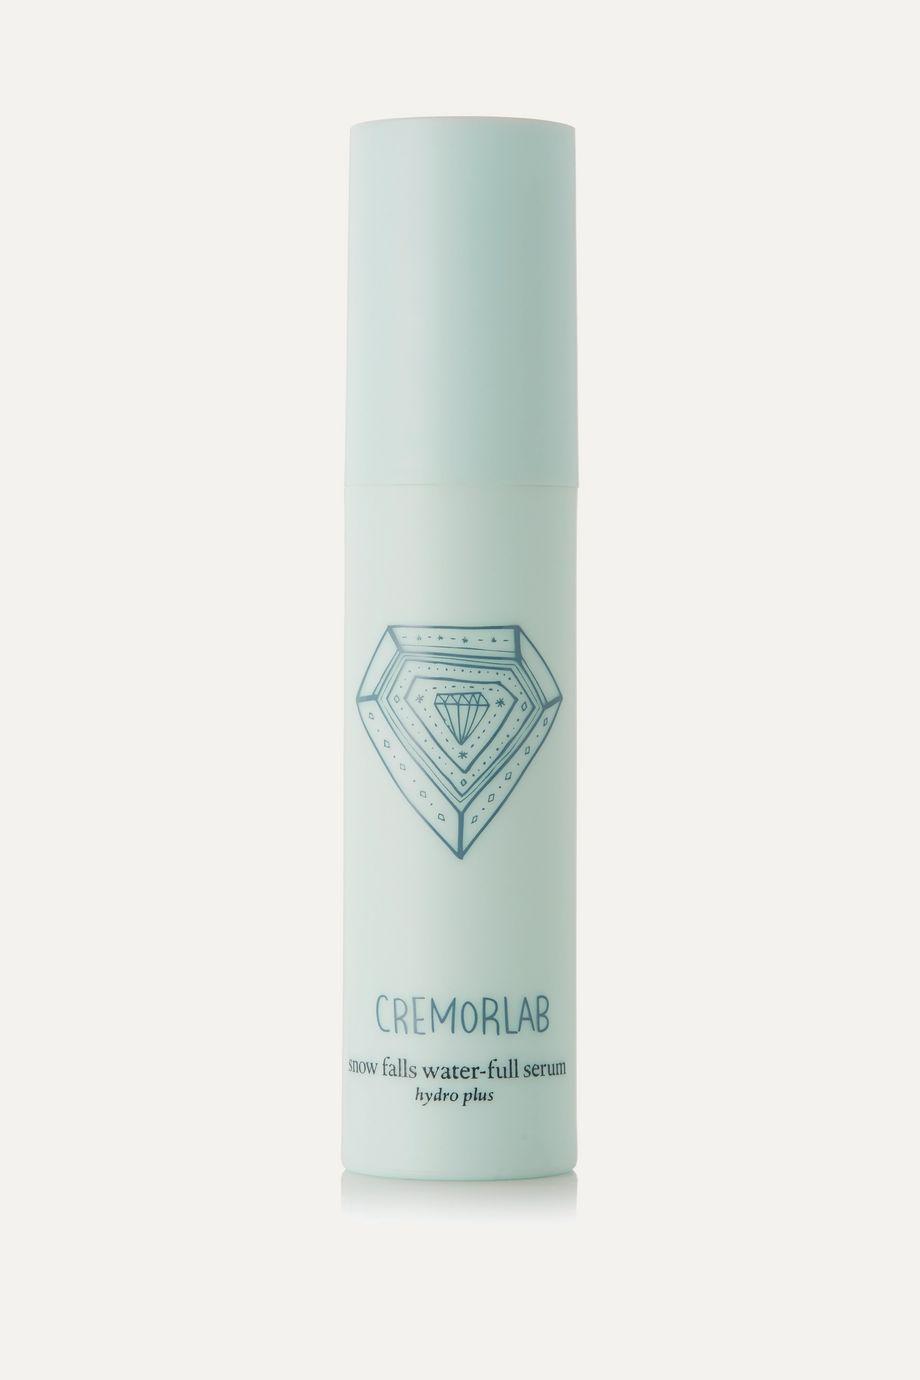 Cremorlab Hydro Plus Snow Falls Water-Full Serum, 30ml